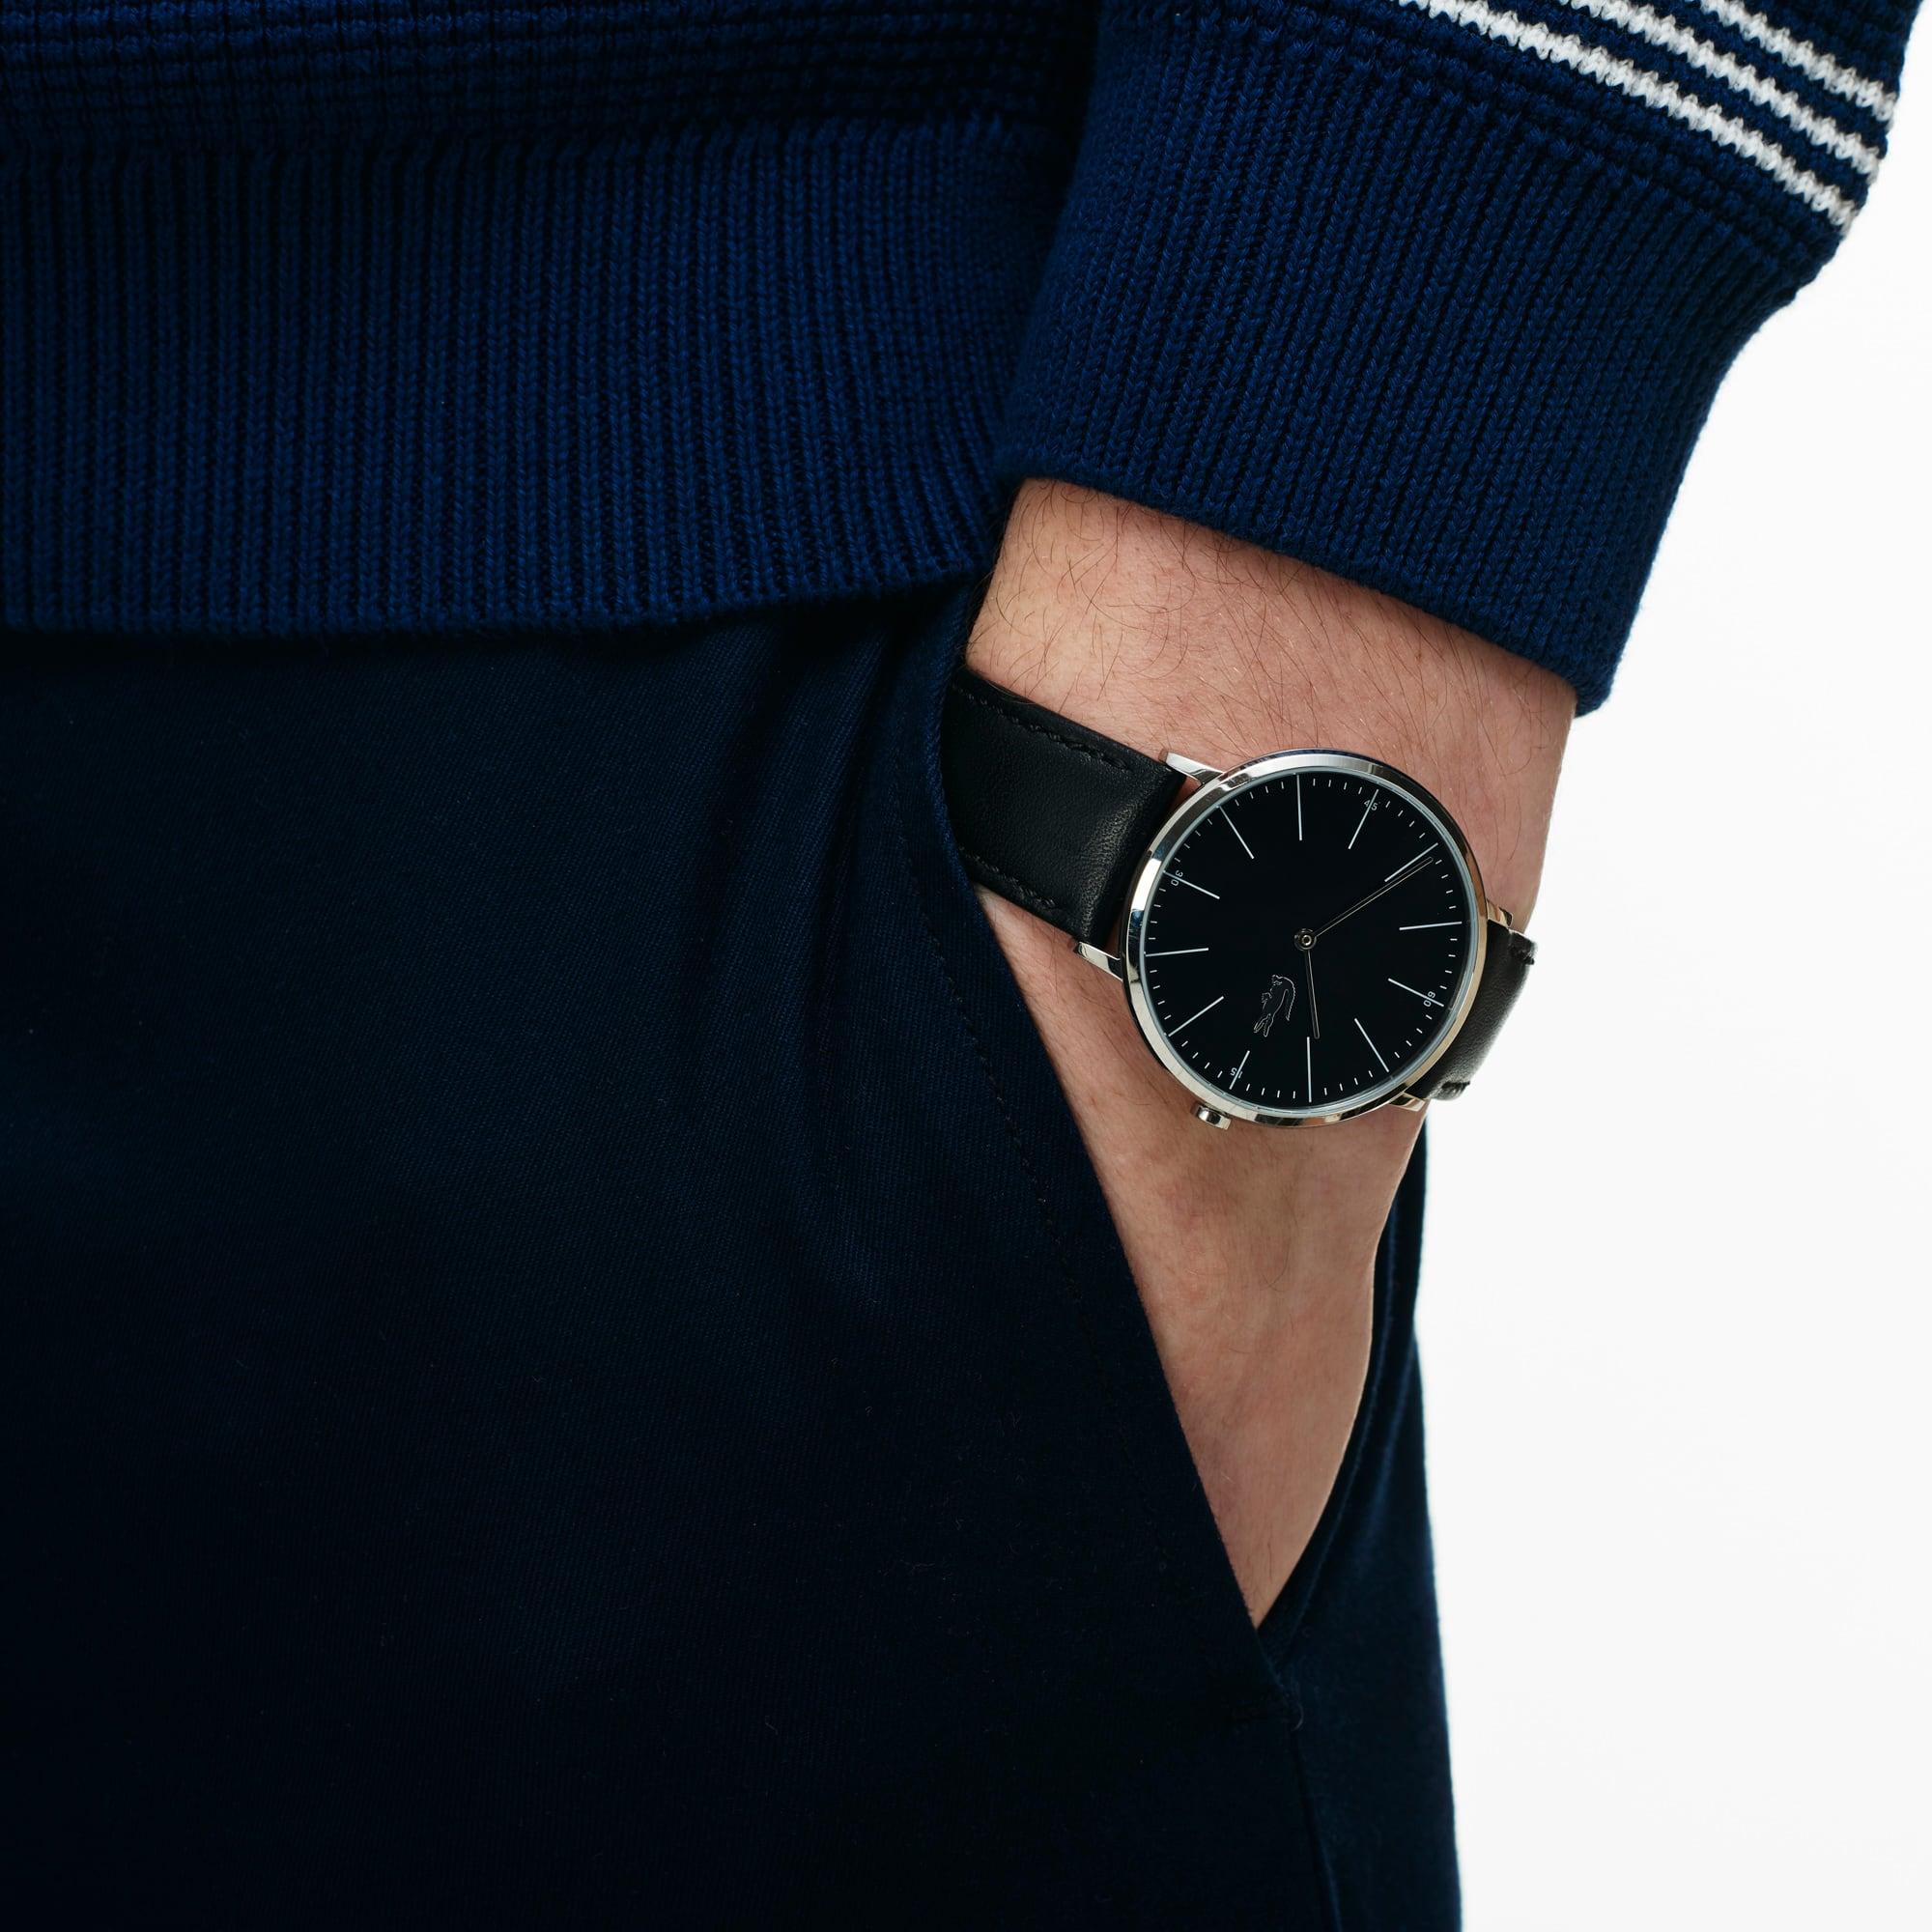 Montre Moon Ultrafine Homme avec Bracelet Noir en Cuir